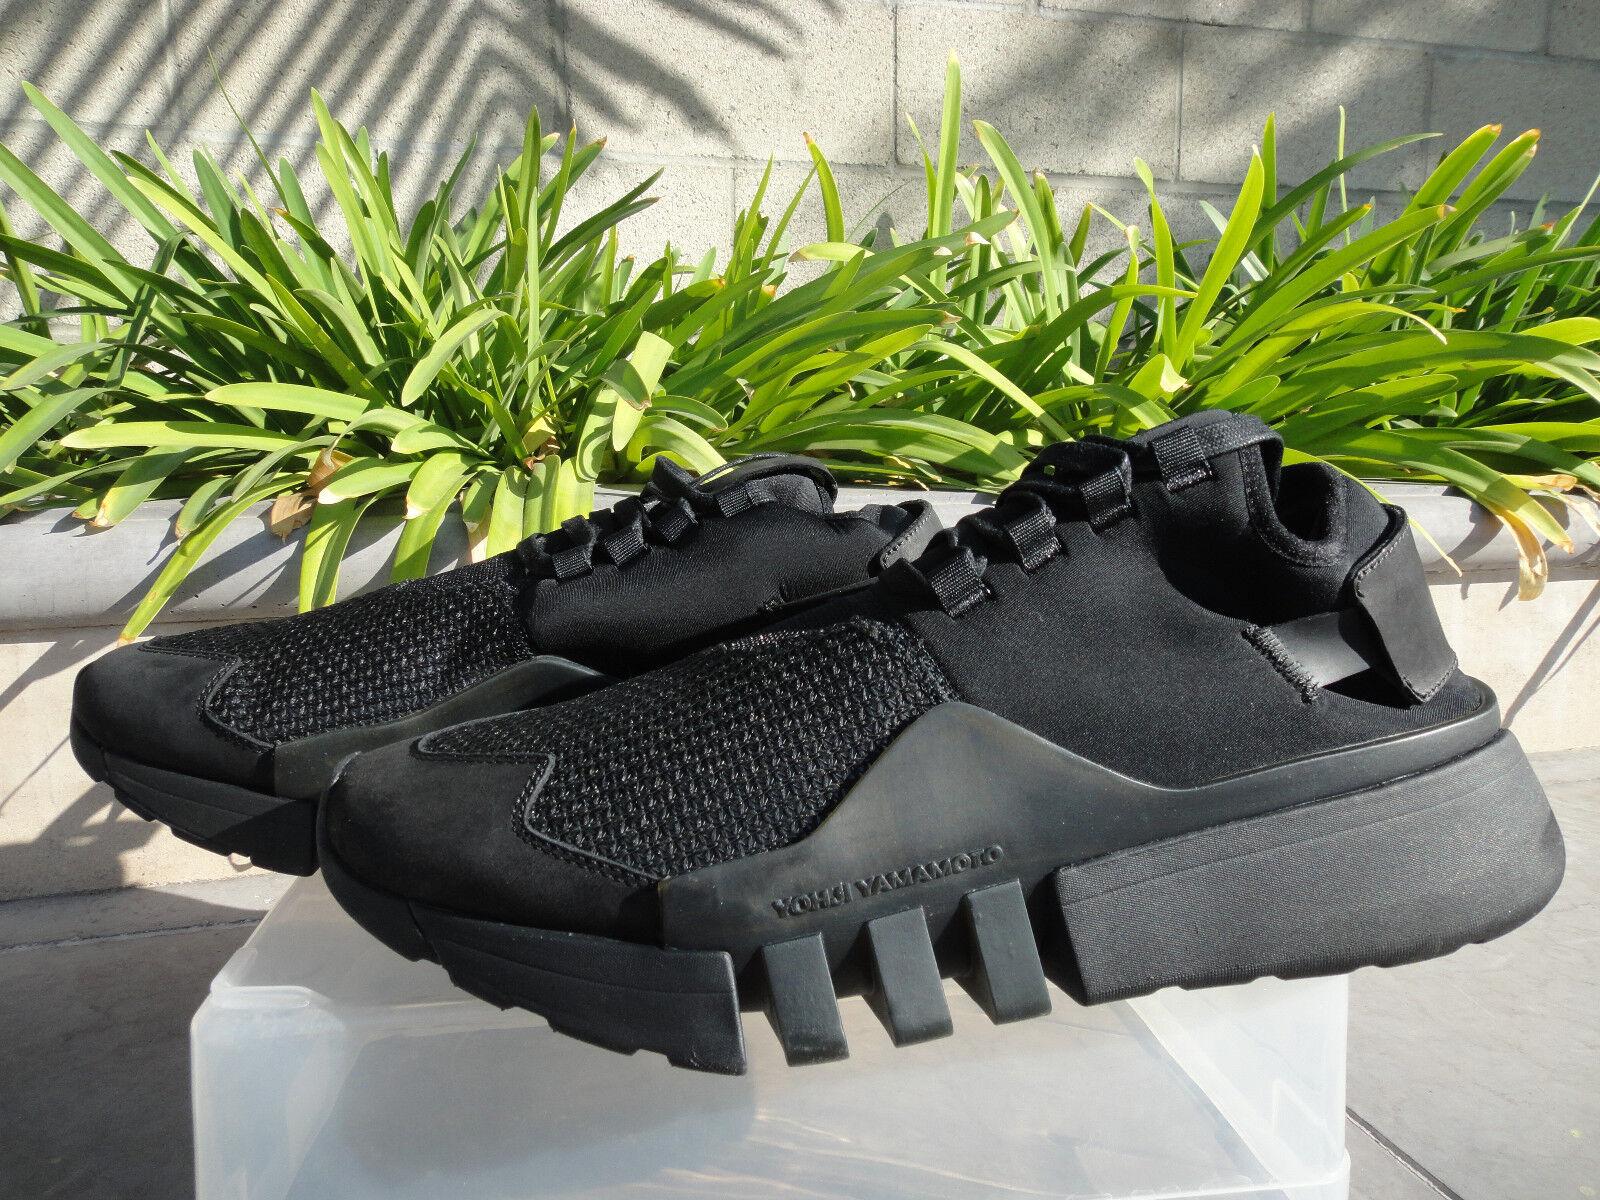 adidas x Y-3 AYERO - CG3171 Black Core Black Olive Sneaker, Mns US Sz 12M